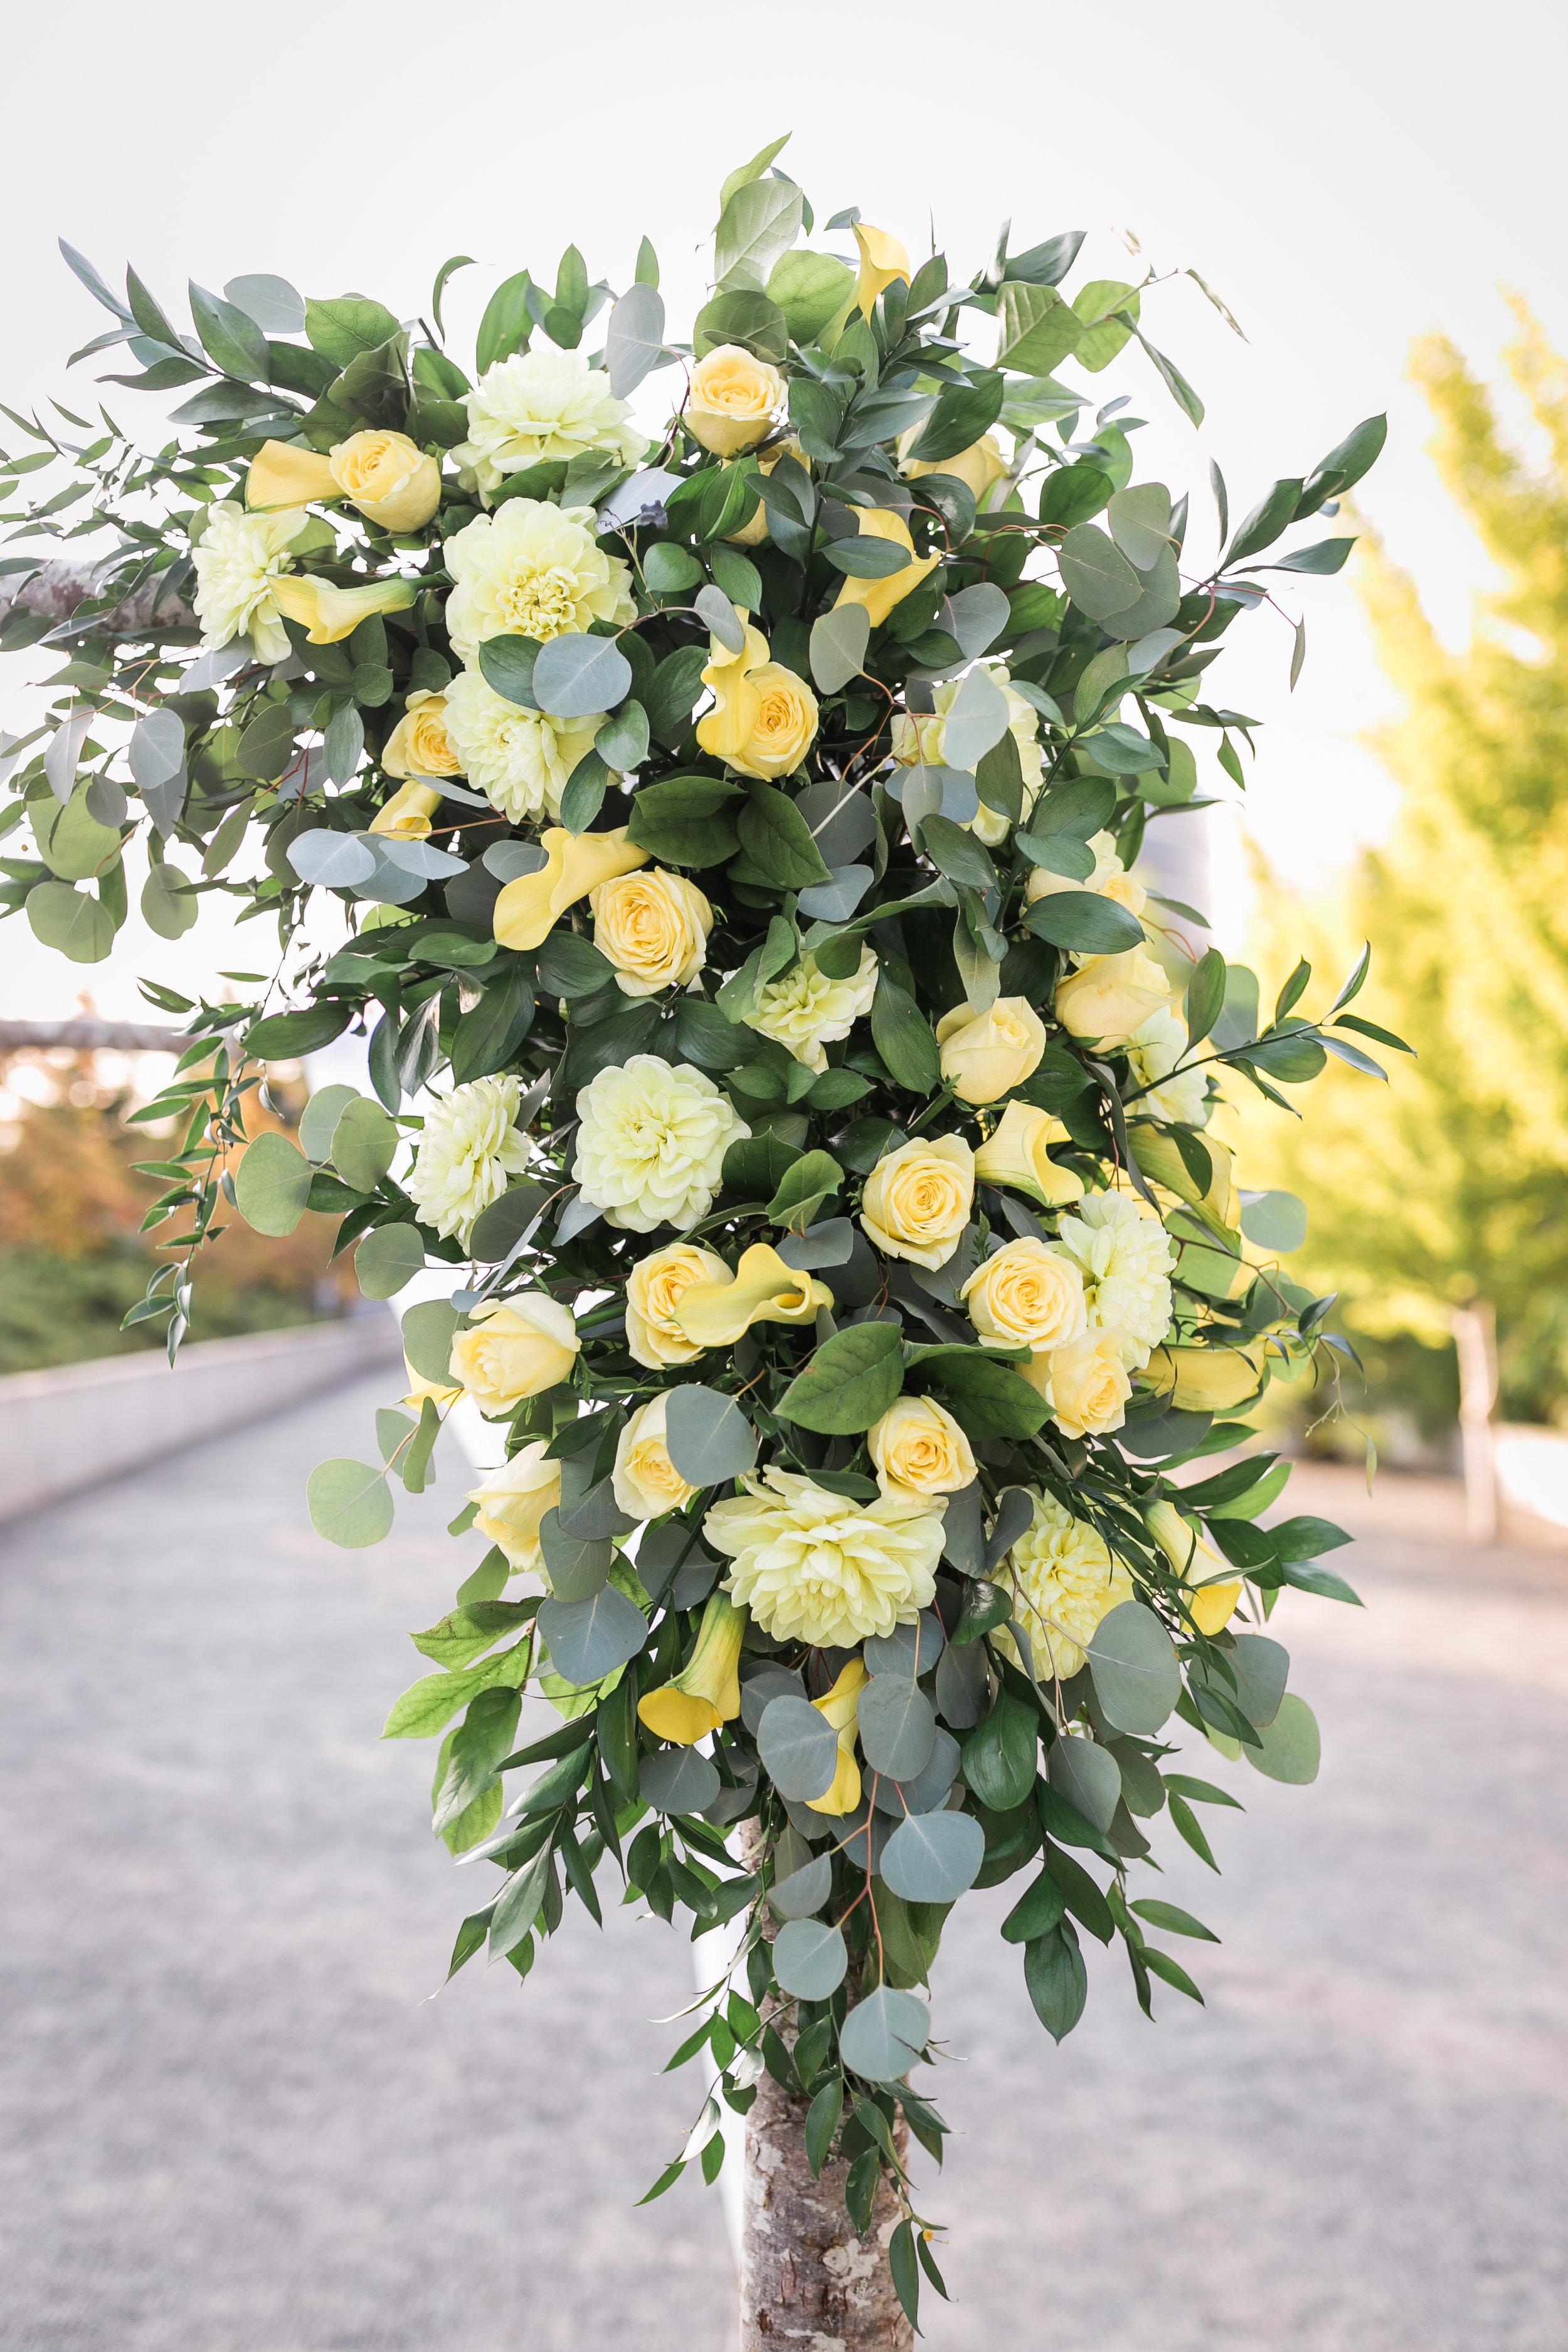 seattle-wedding-chuppah-floral-greenery-yellow-modern-lush